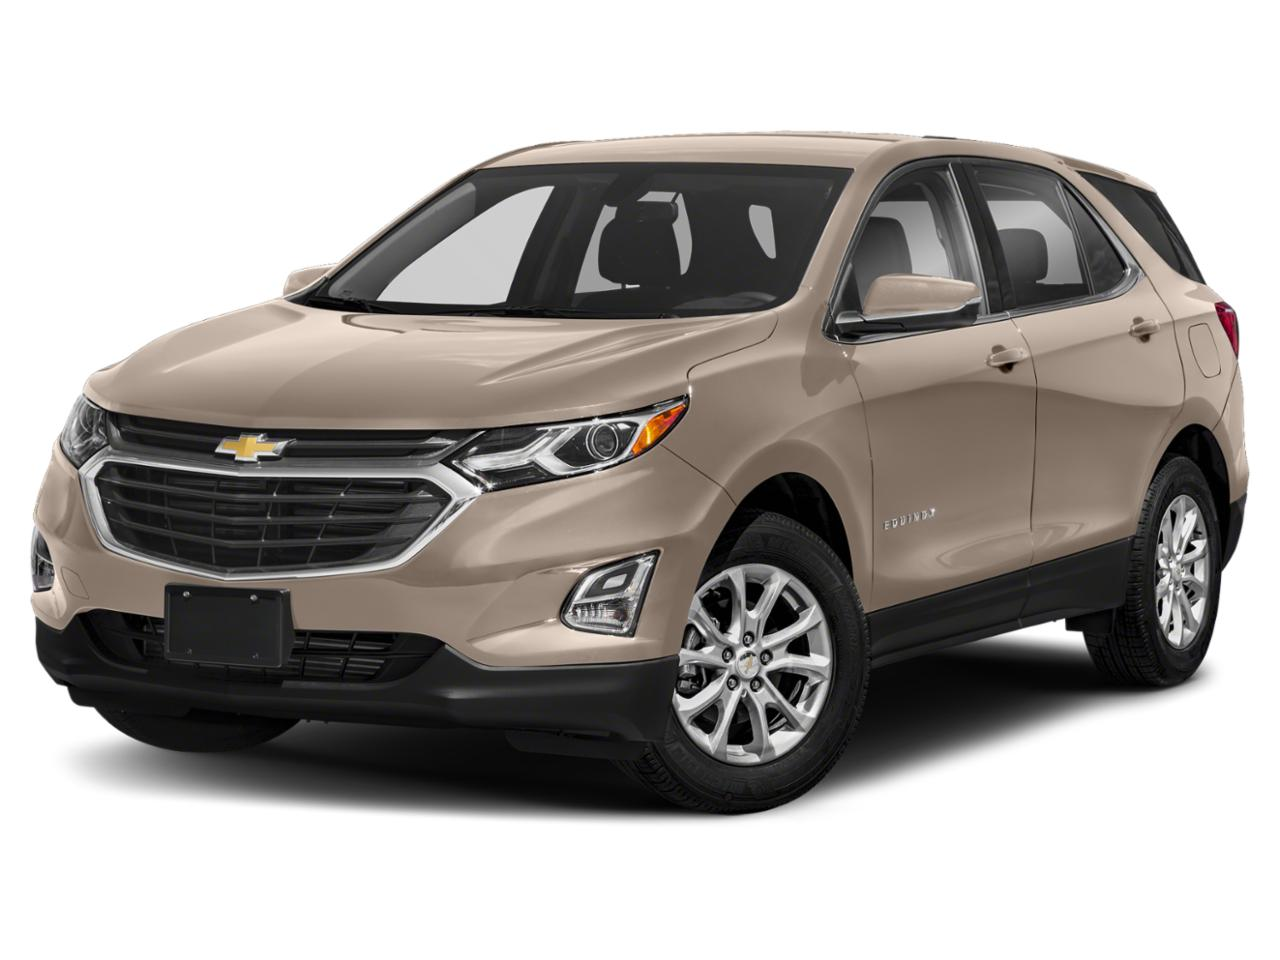 2018 Chevrolet Equinox Vehicle Photo in Avon, CT 06001